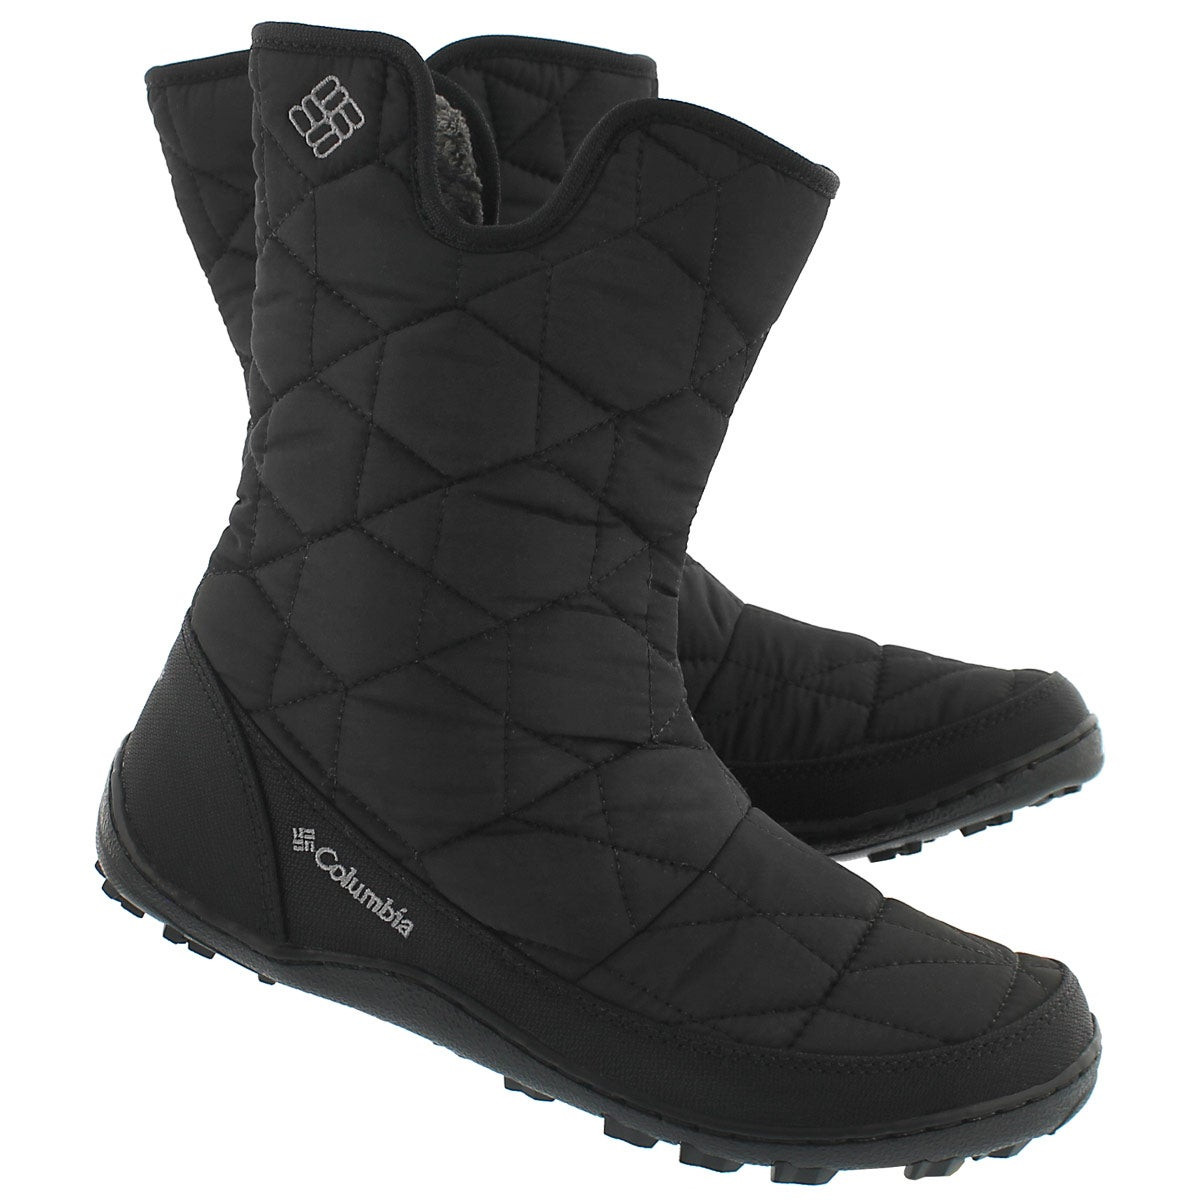 Lds Minx Slip II blk pull on winter boot